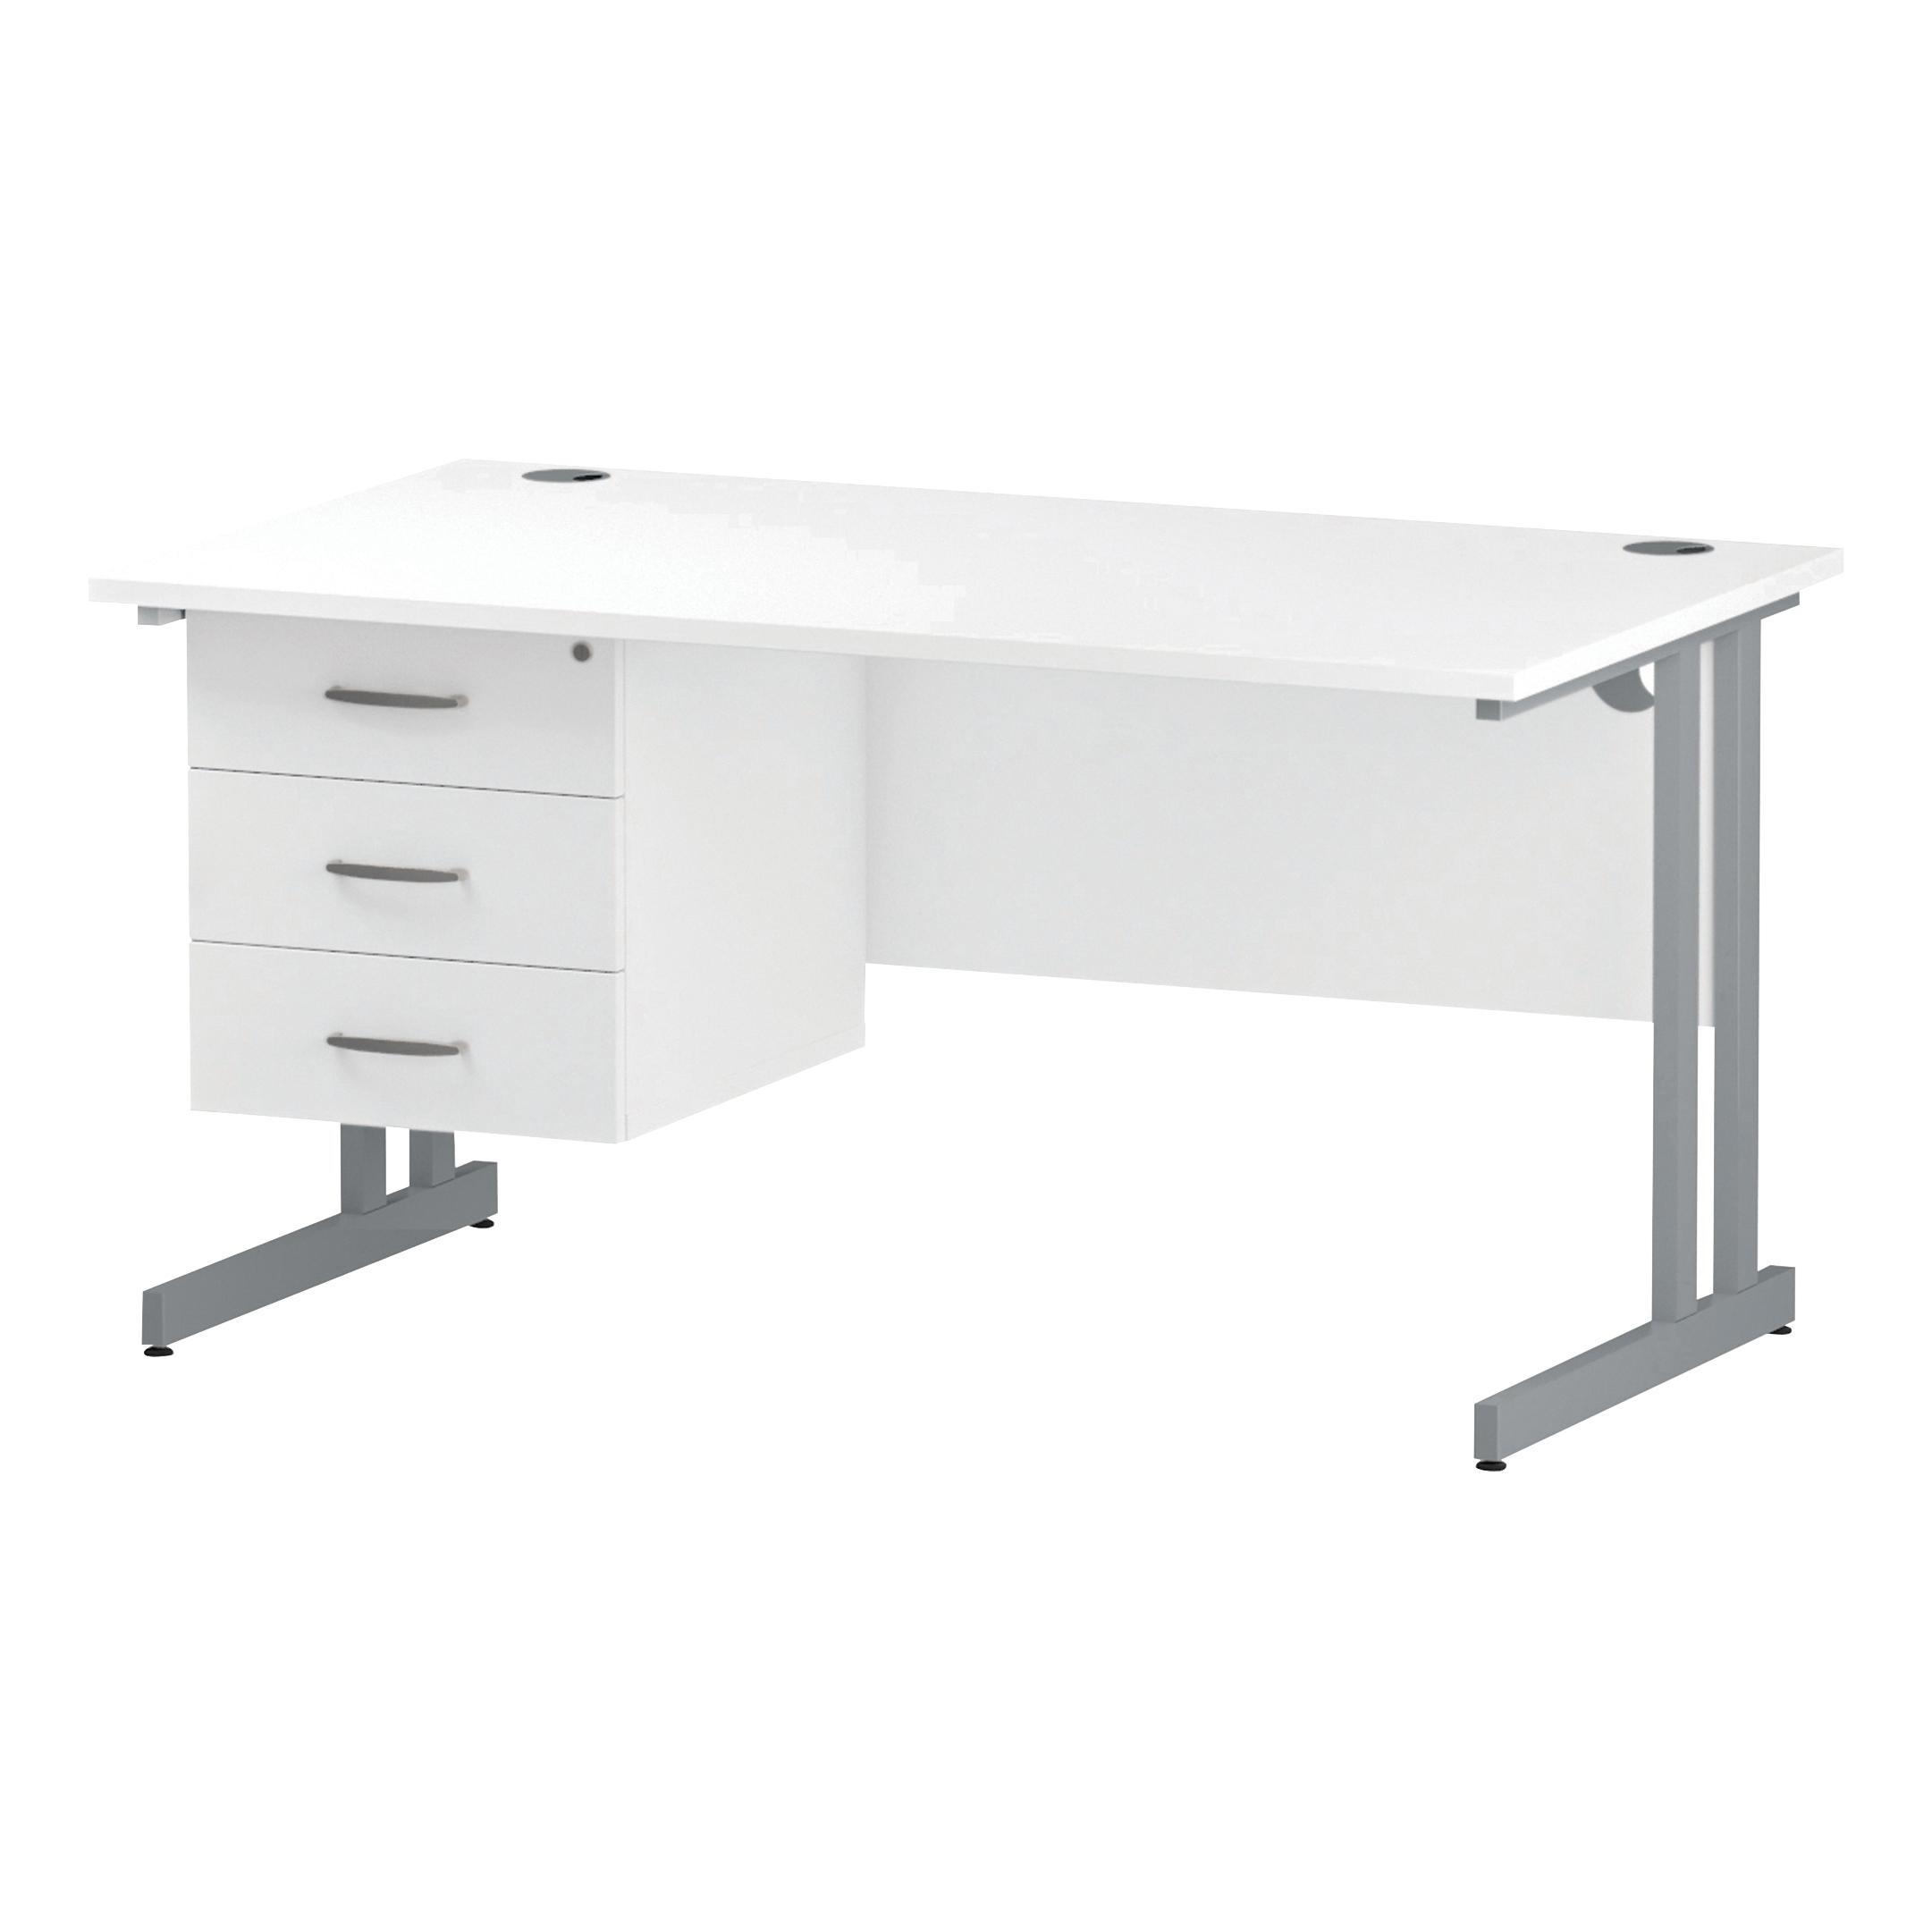 Trexus Rectangular Desk Silver Cantilever Leg 1400x800mm Fixed Pedestal 3 Drawers White Ref I002214